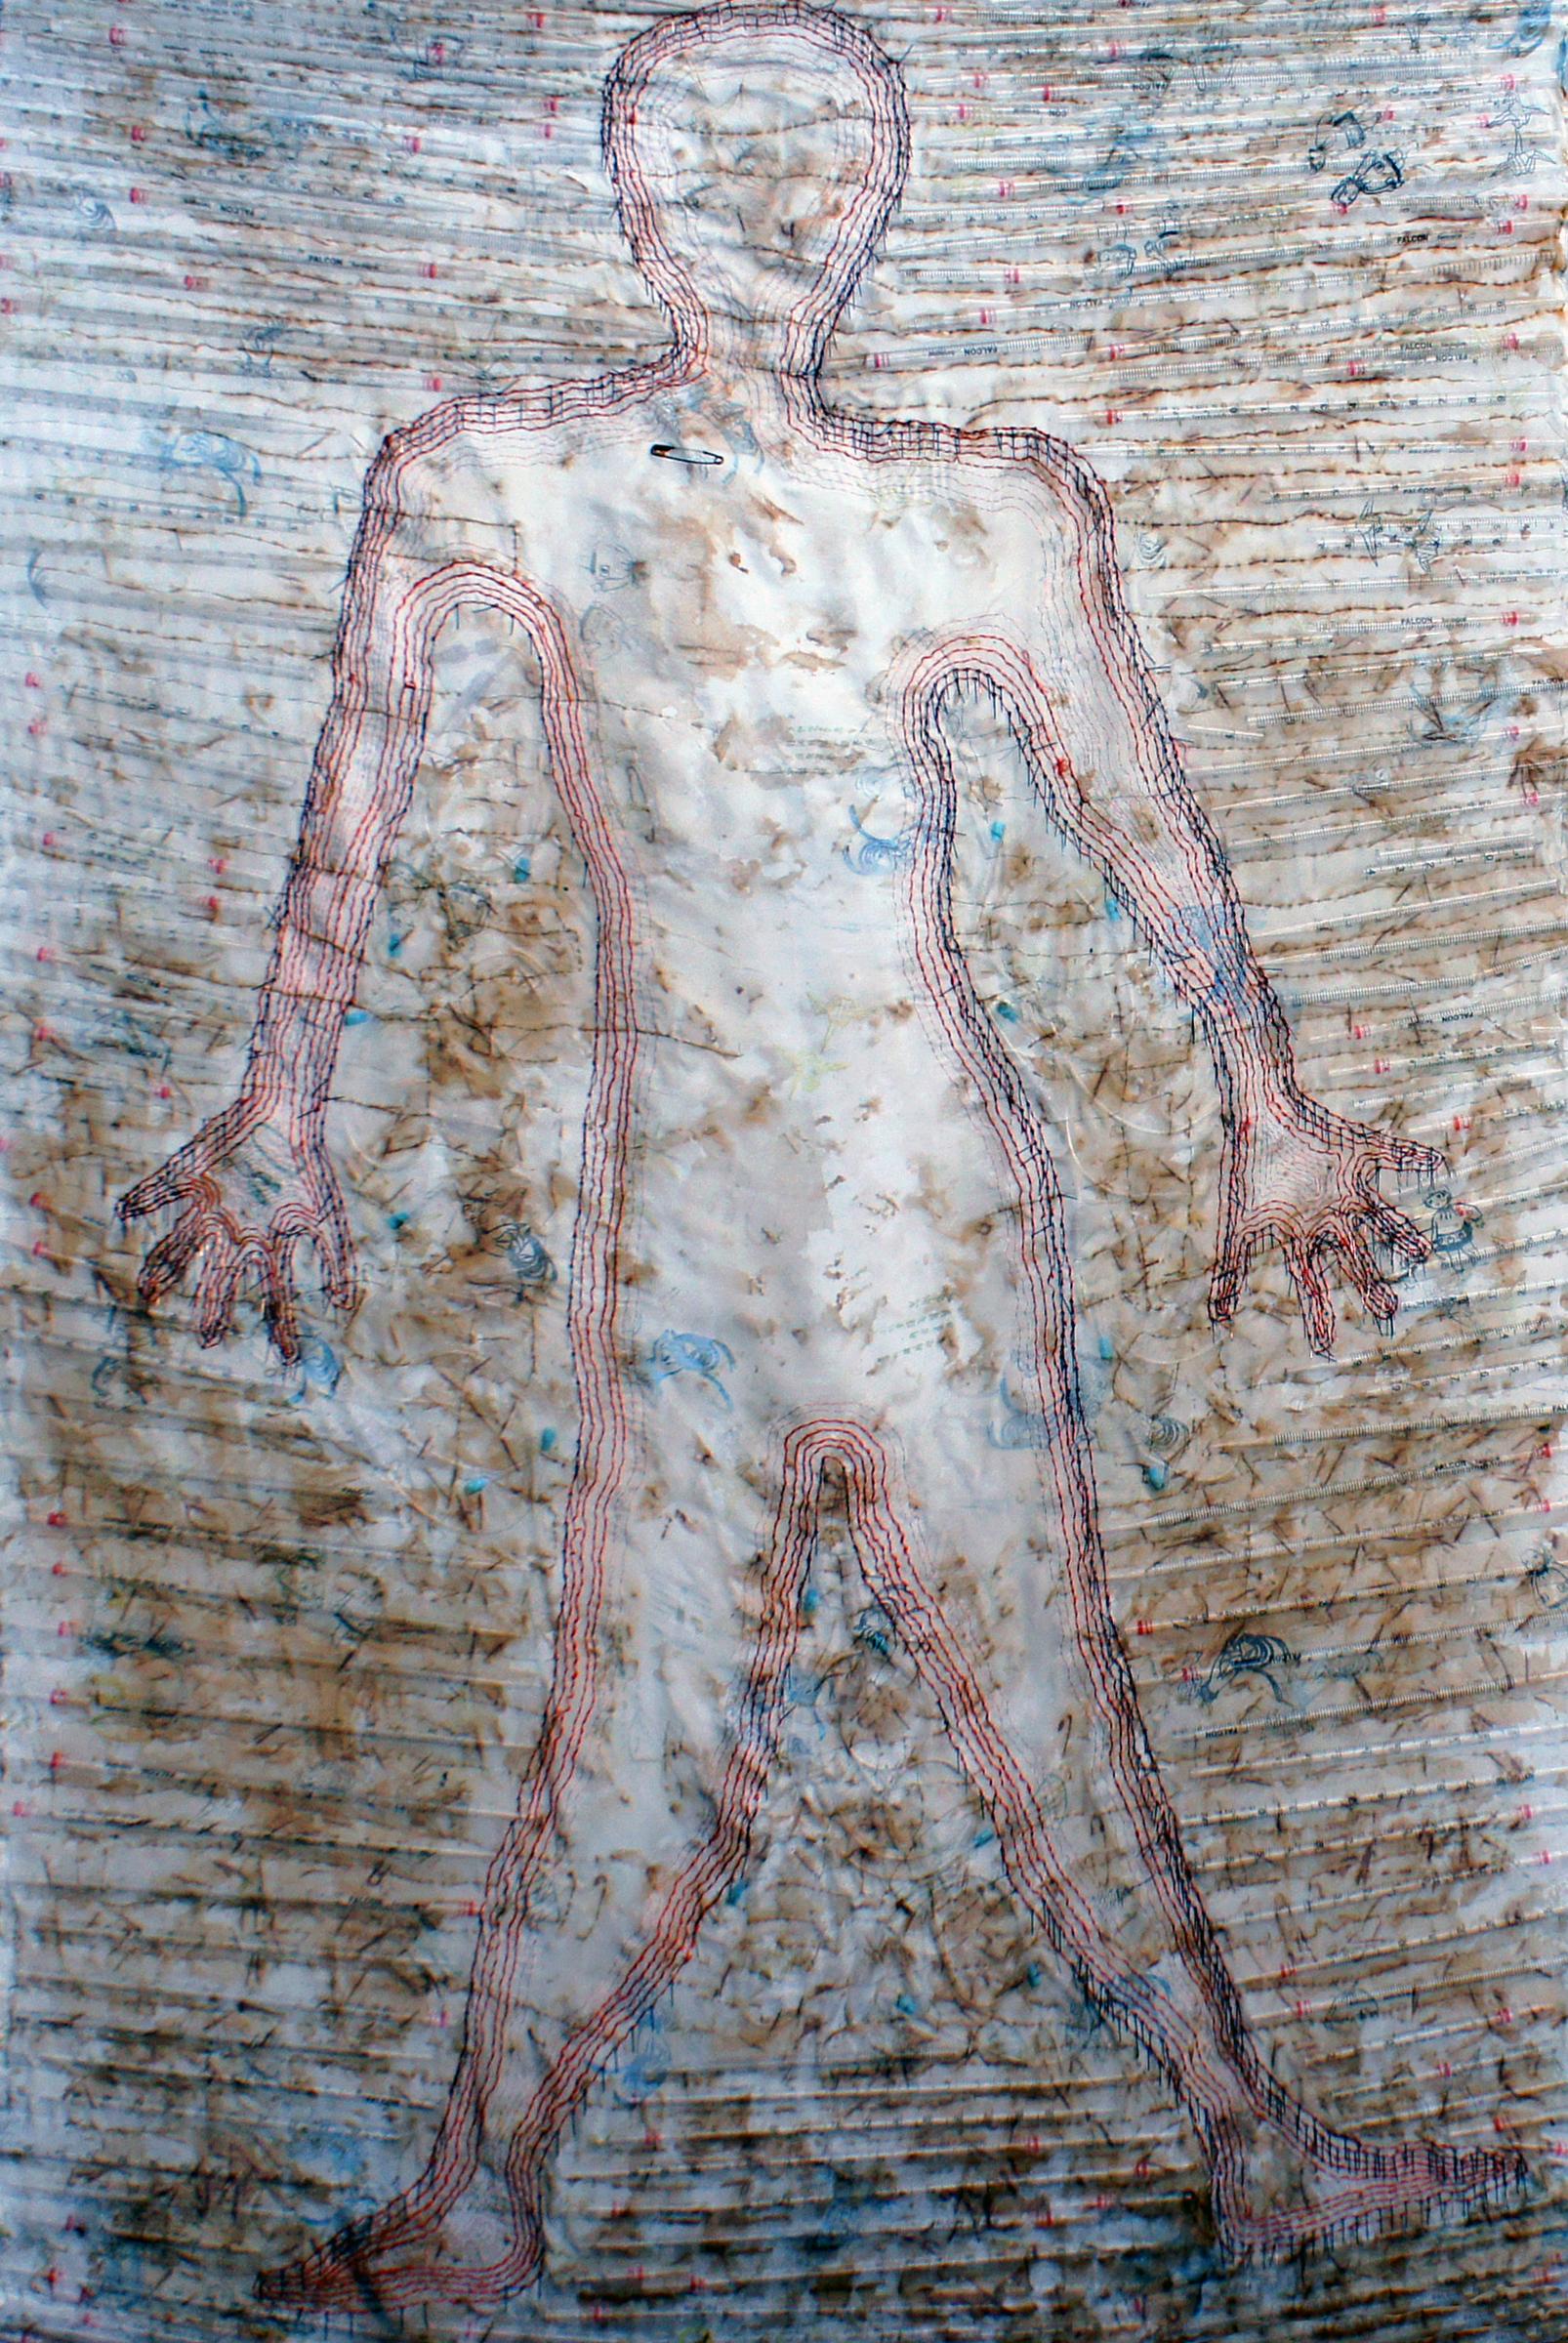 Upholding: The Effort of Preserving Oneself